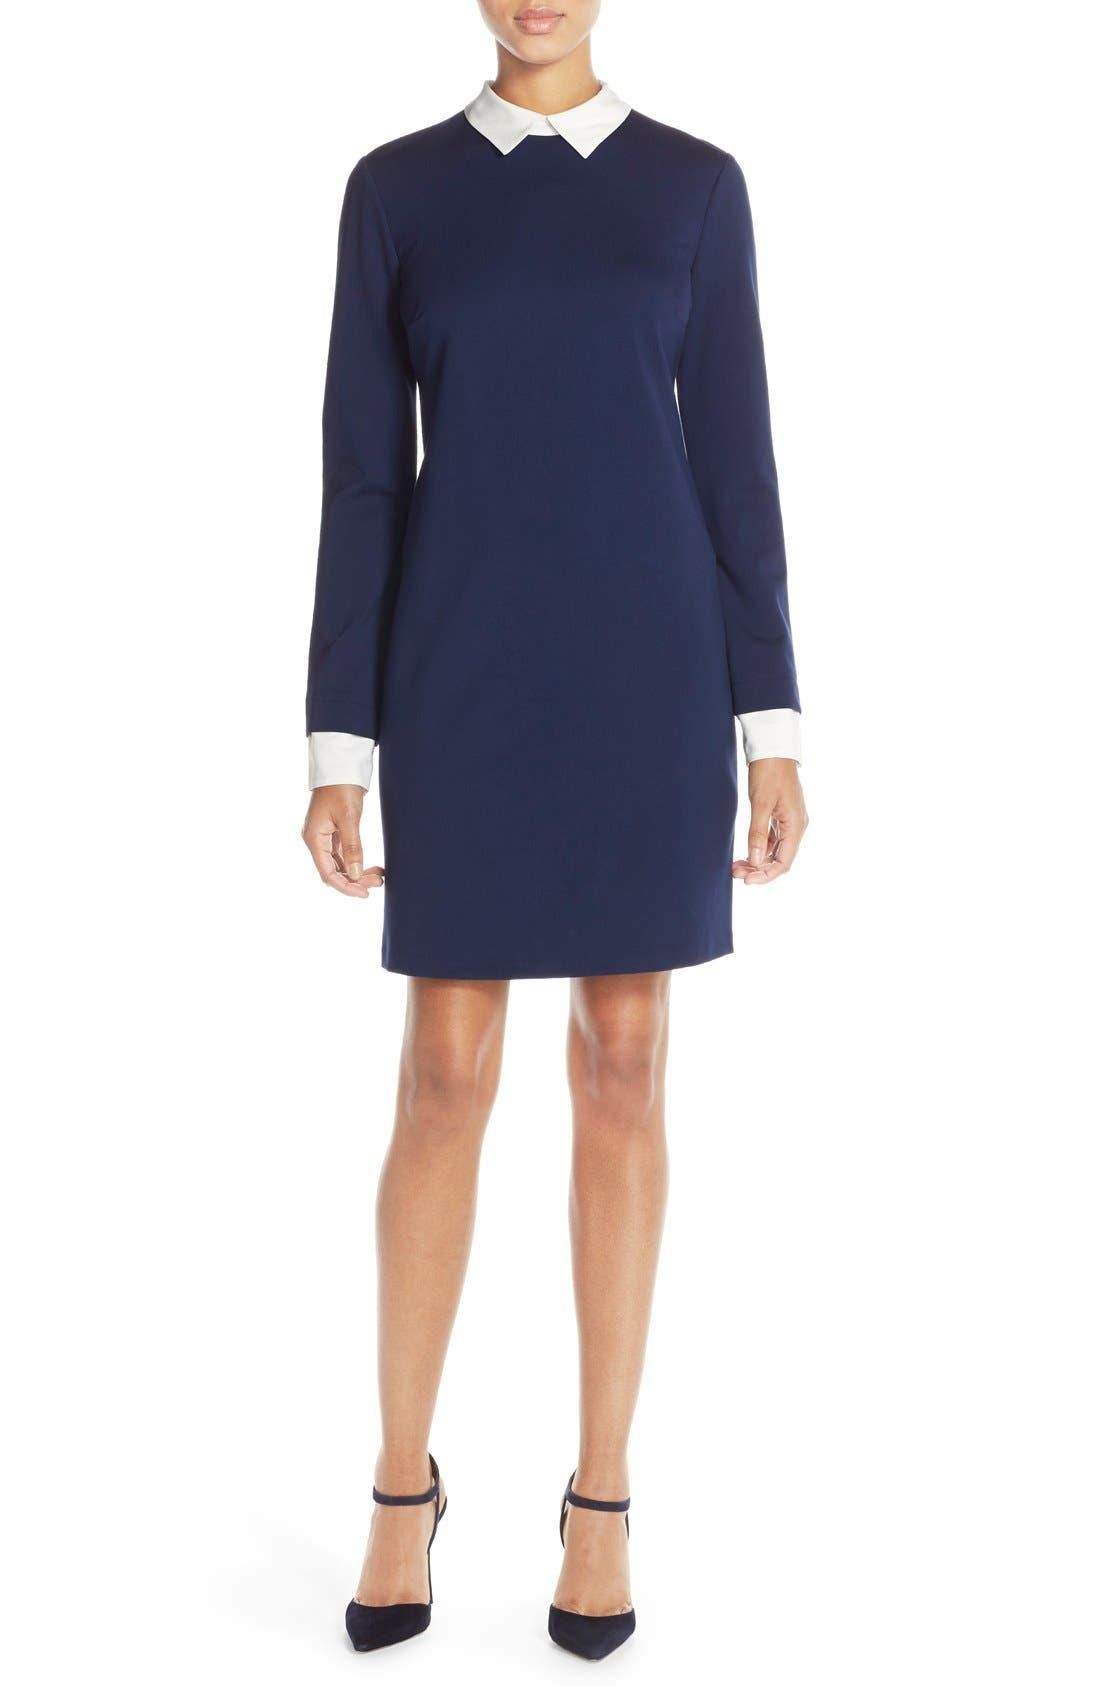 Alternate Image 1 Selected - CeCe by Cynthia Steffe Tech Ponte Shift Dress